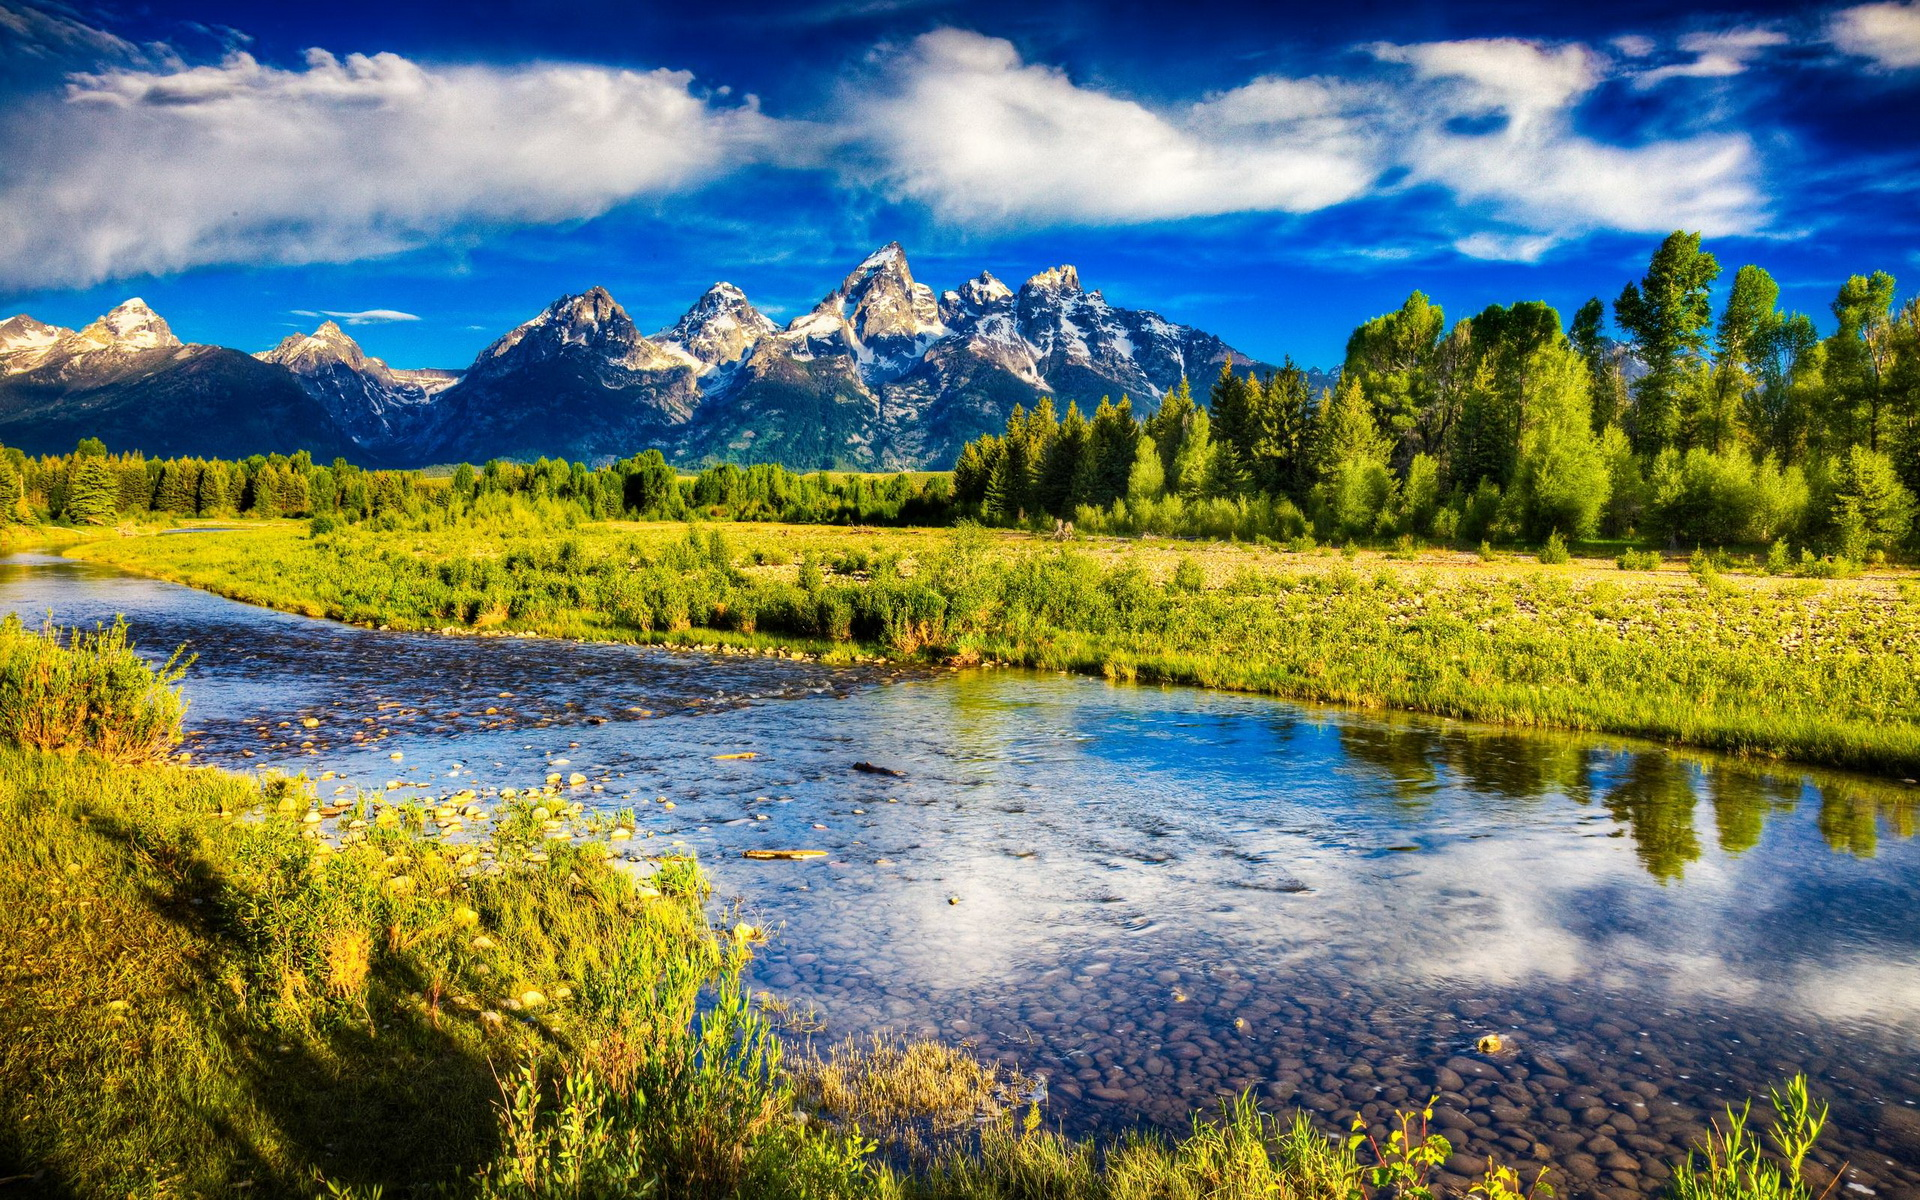 Beautiful Mountain Scenery - Mountain Scenery , HD Wallpaper & Backgrounds